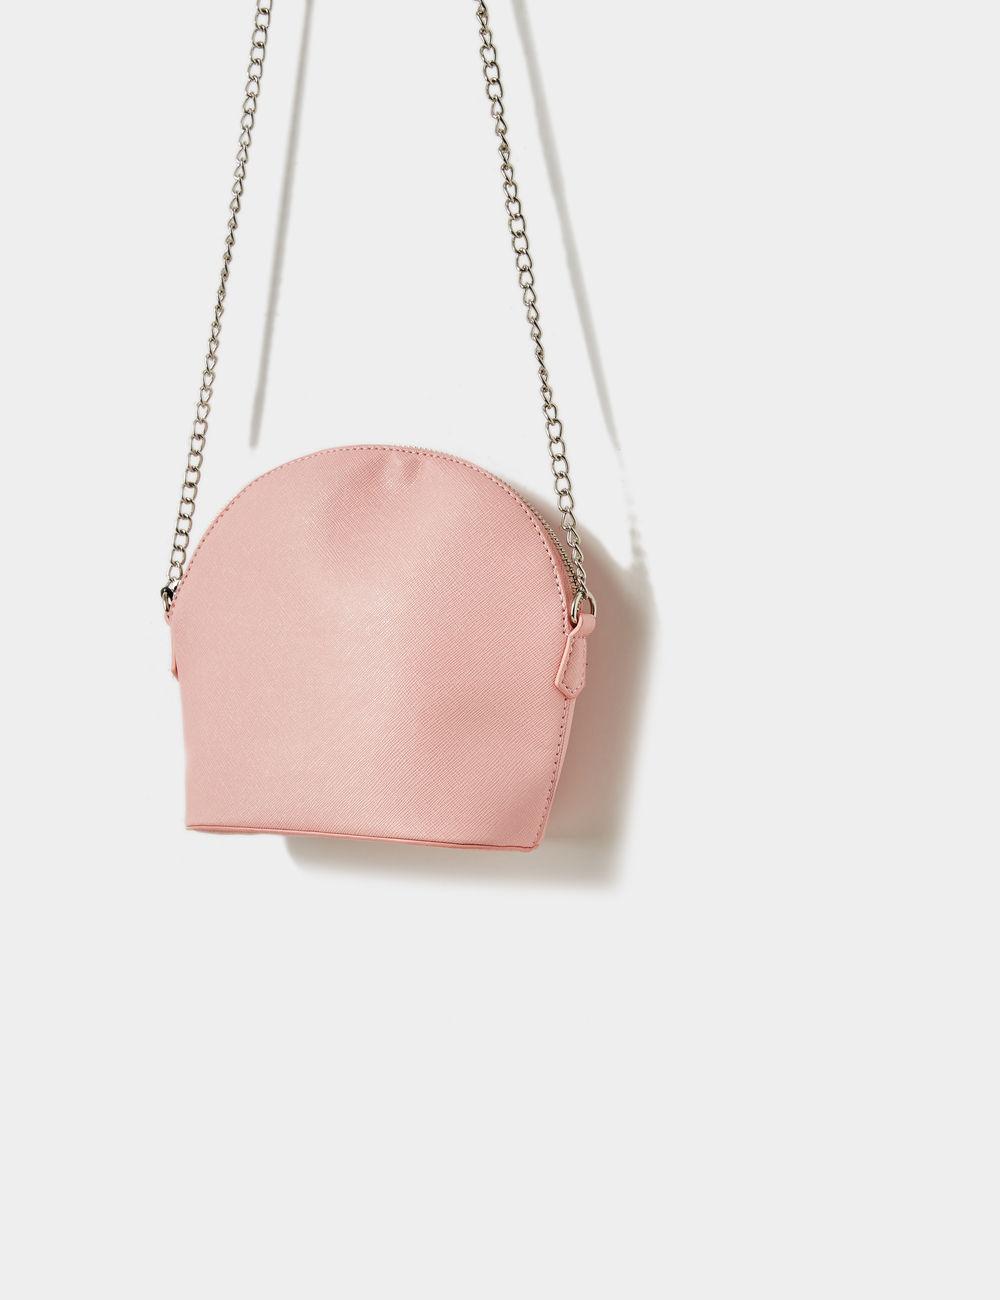 sac bandoulière rose clair Jennyfer prix 9,99 €